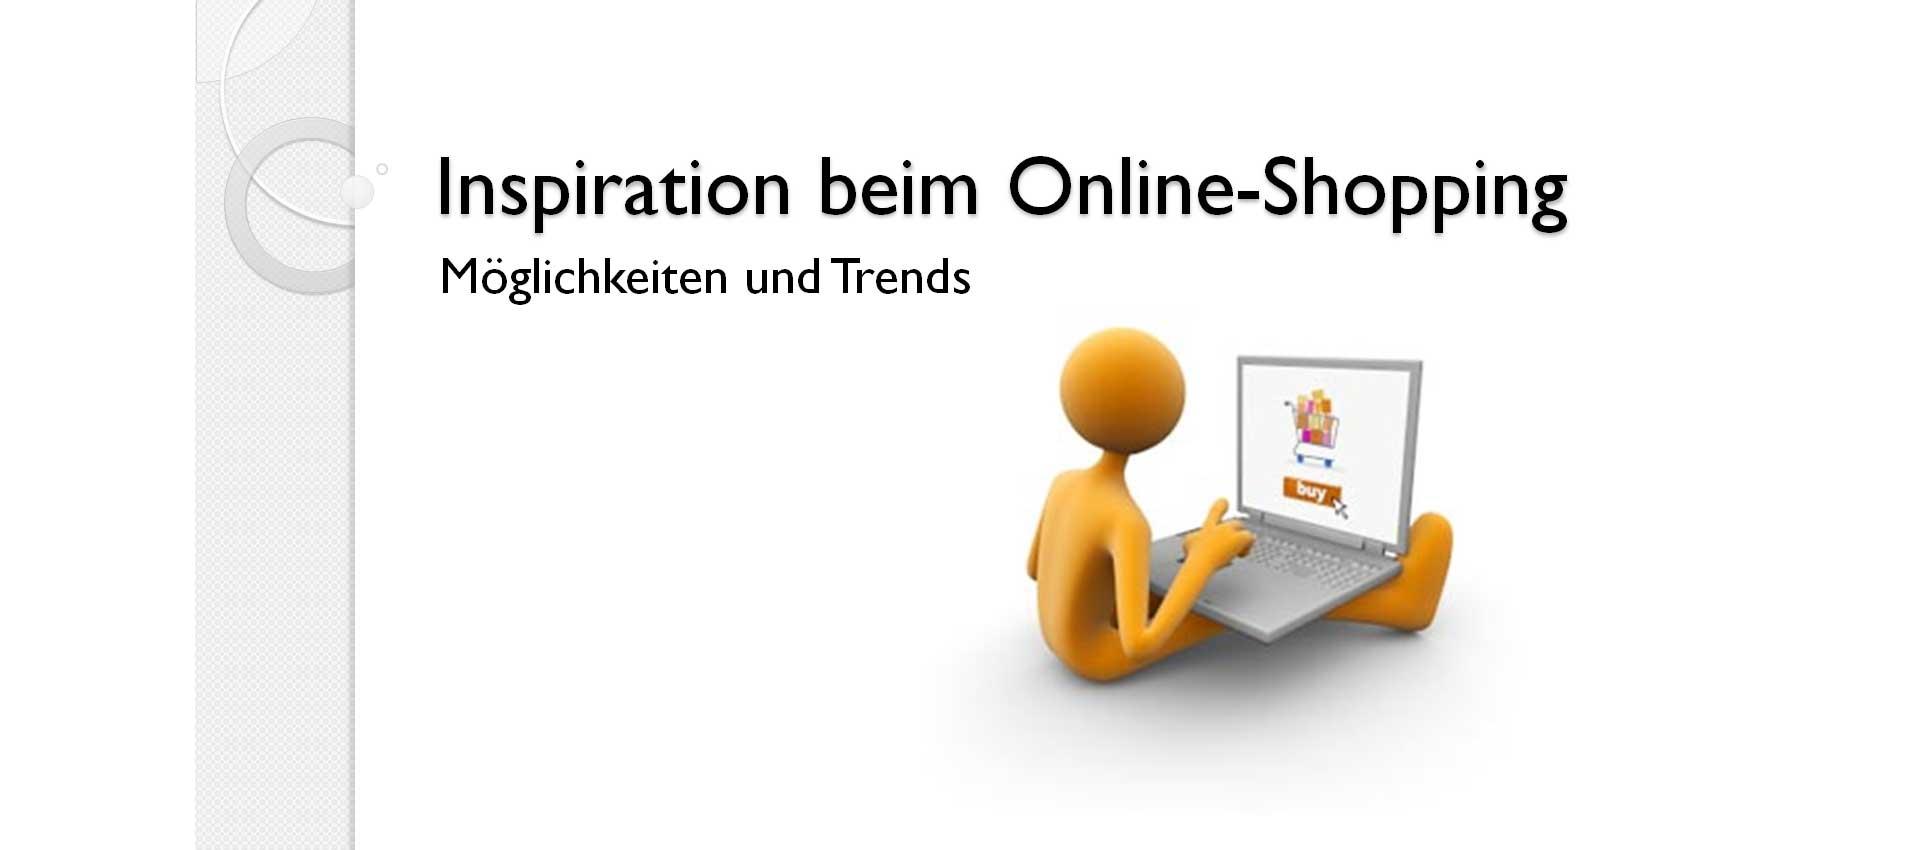 Inspiration beim Online-Shopping